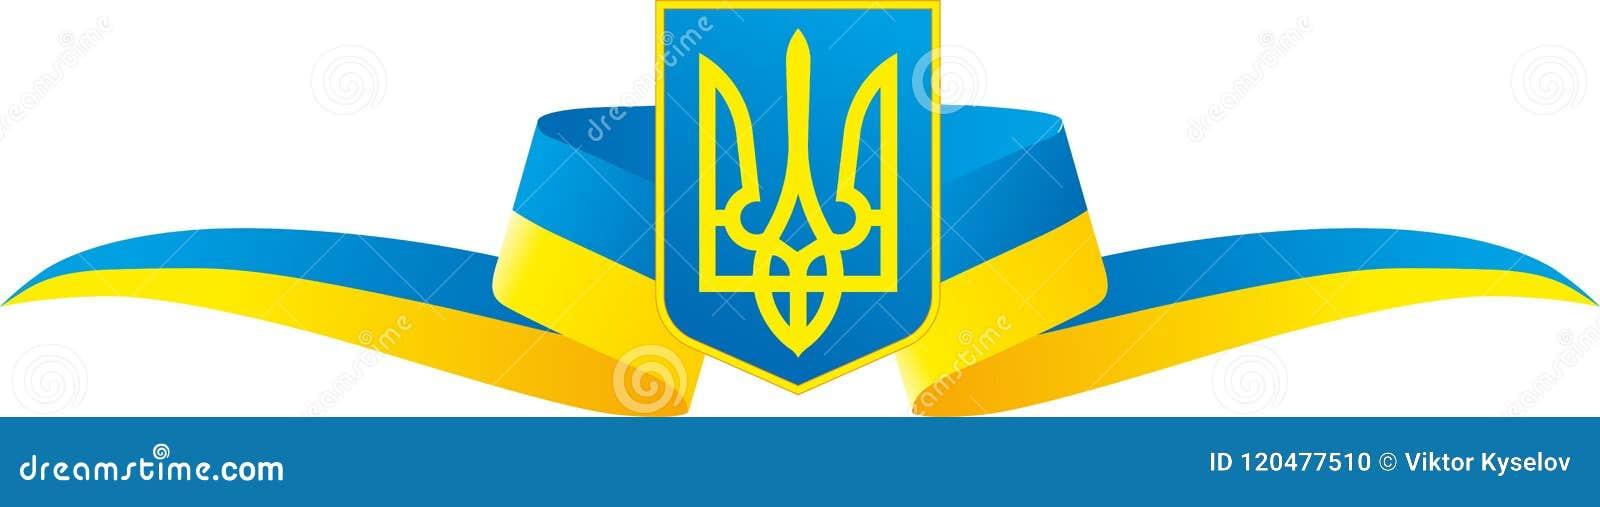 Żakiet ręki i flaga Ukraina